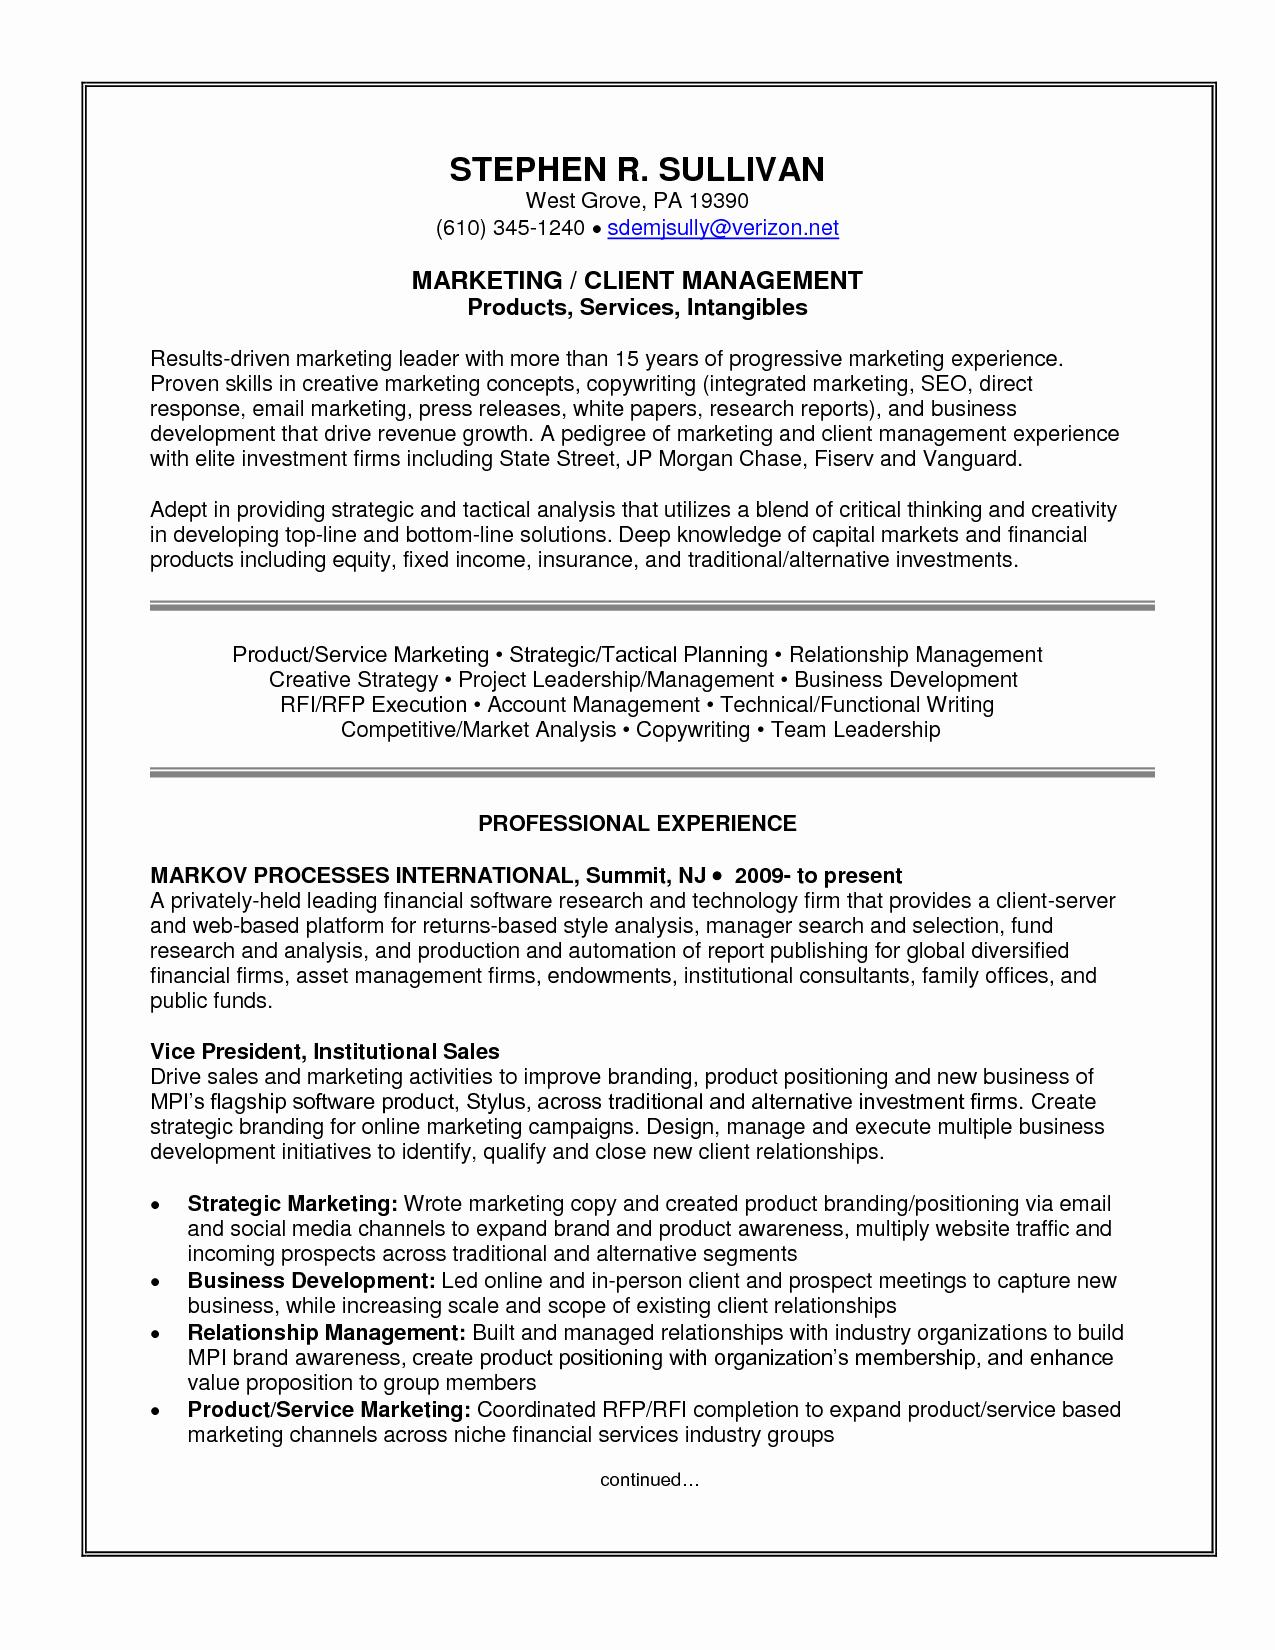 Ad Sales Planner Resume